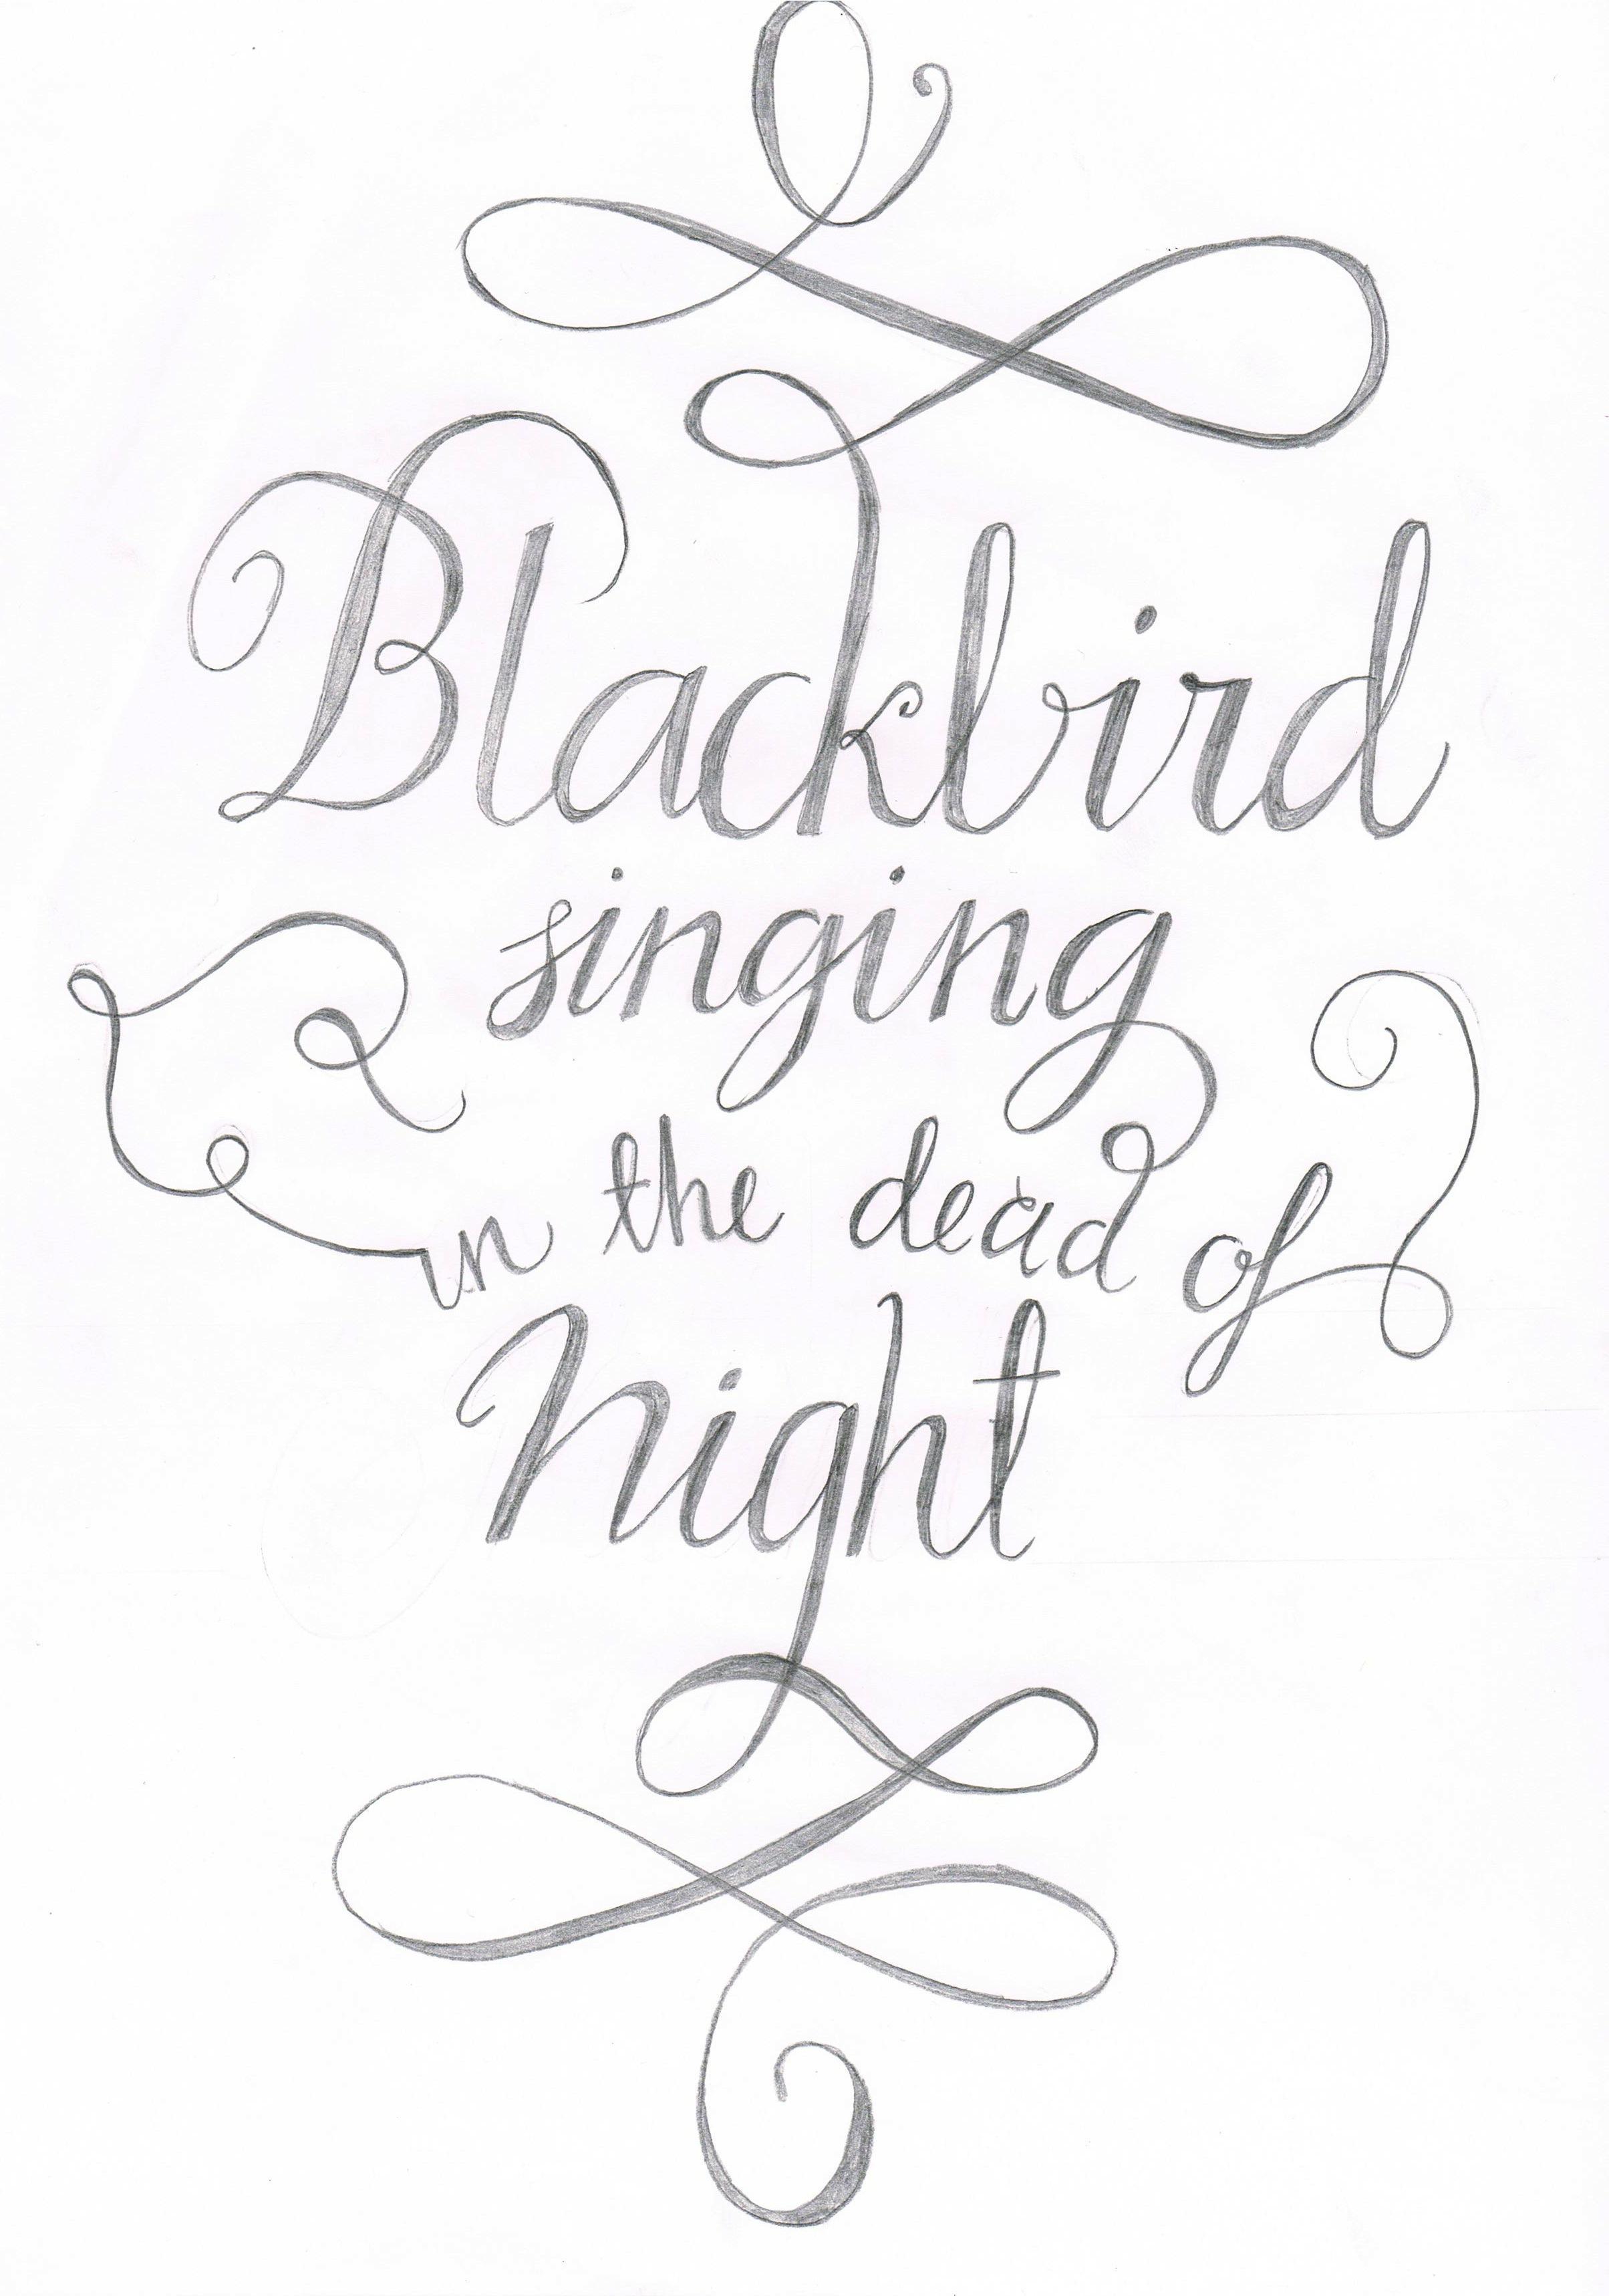 Blackbird. - image 3 - student project